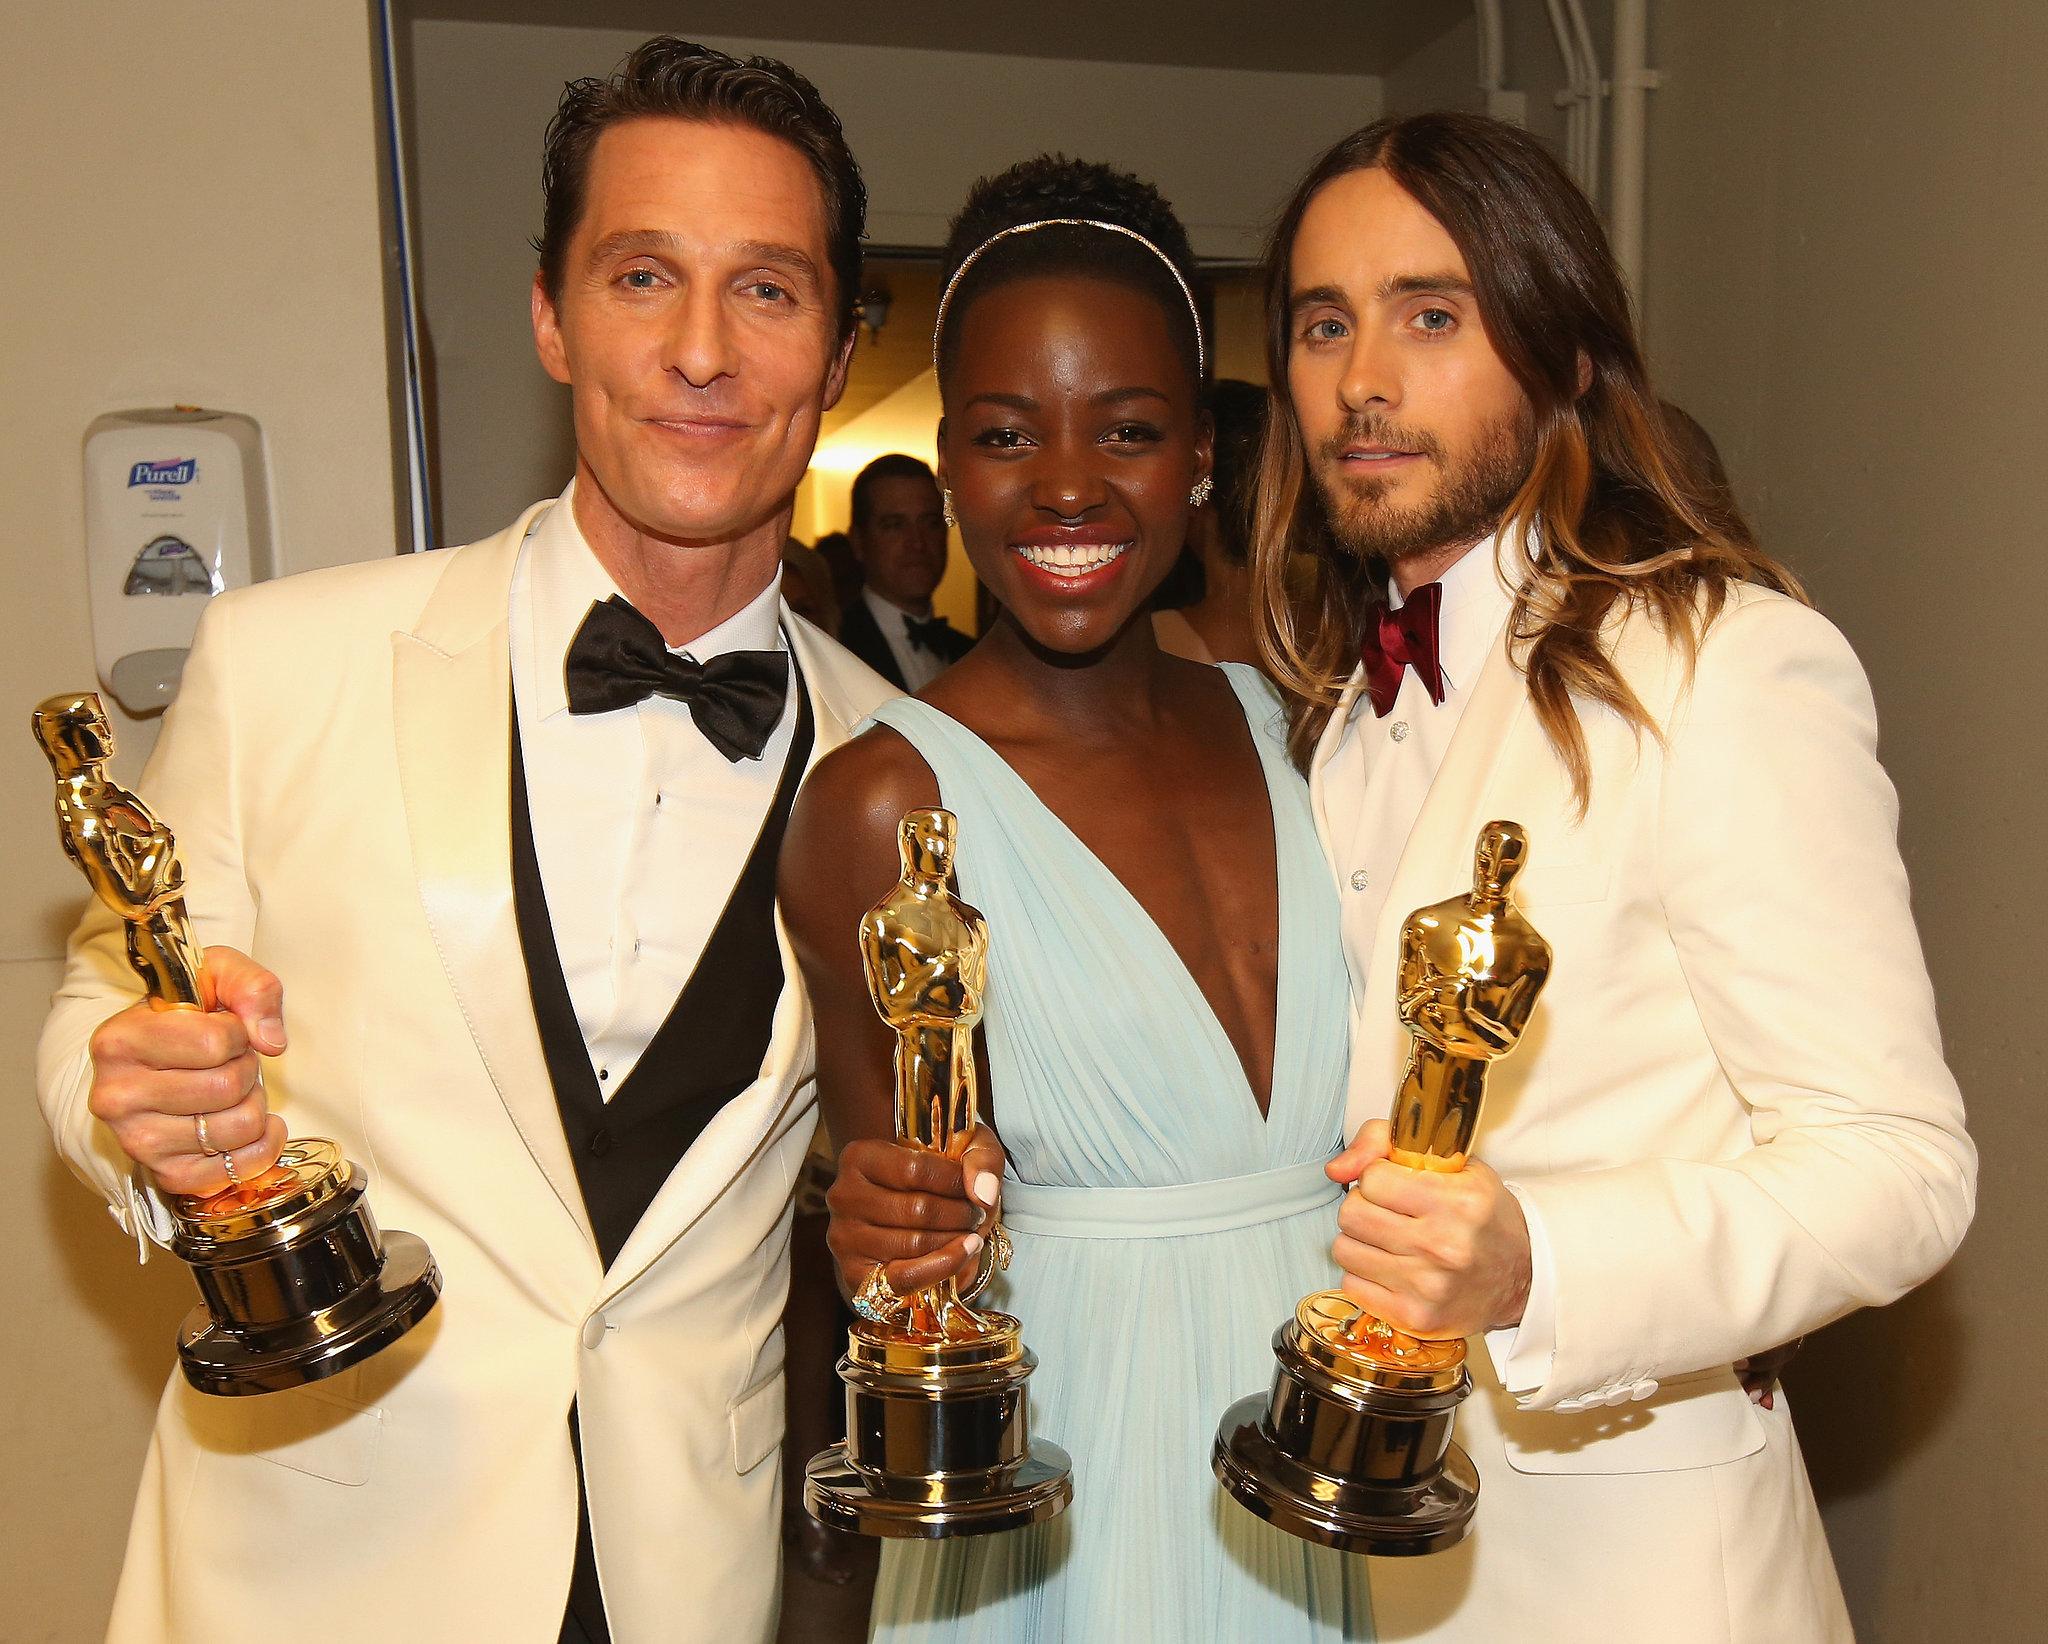 Matthew McConaughey and Jared Leto posed alongside Lupita Nyong'o with their awards.